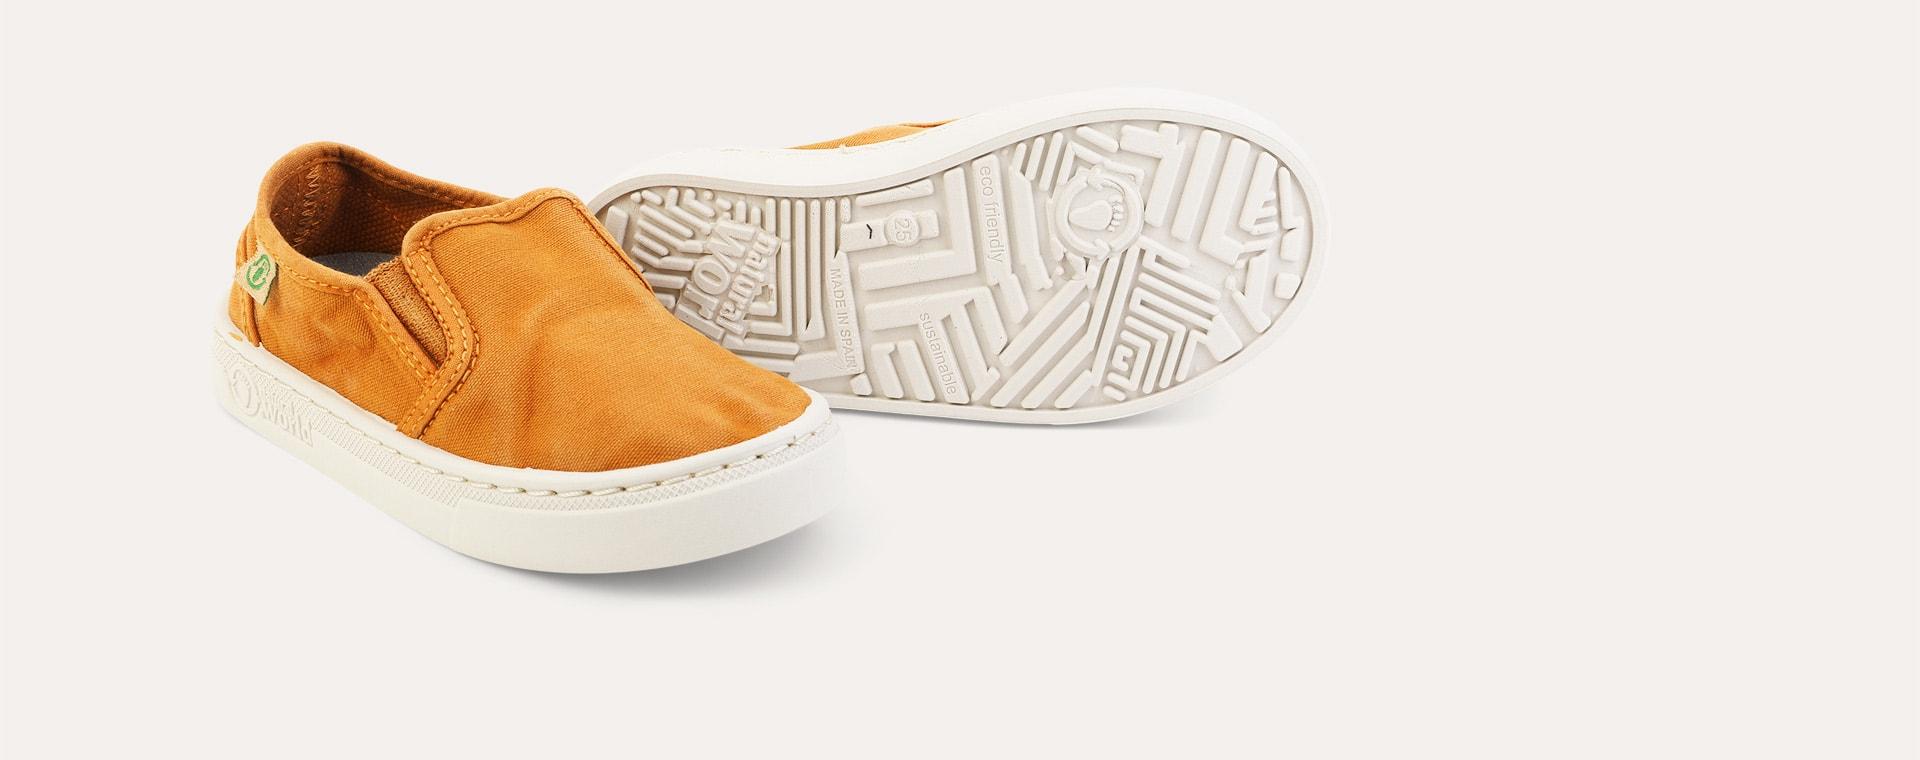 Mustard Natural World Canvas Slip-On Shoe